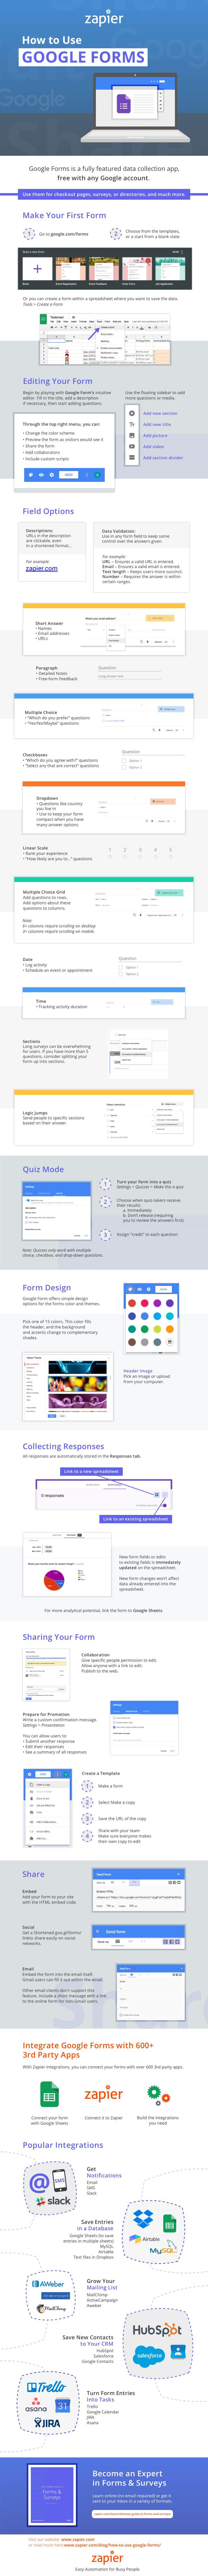 Google Forms cheat sheet